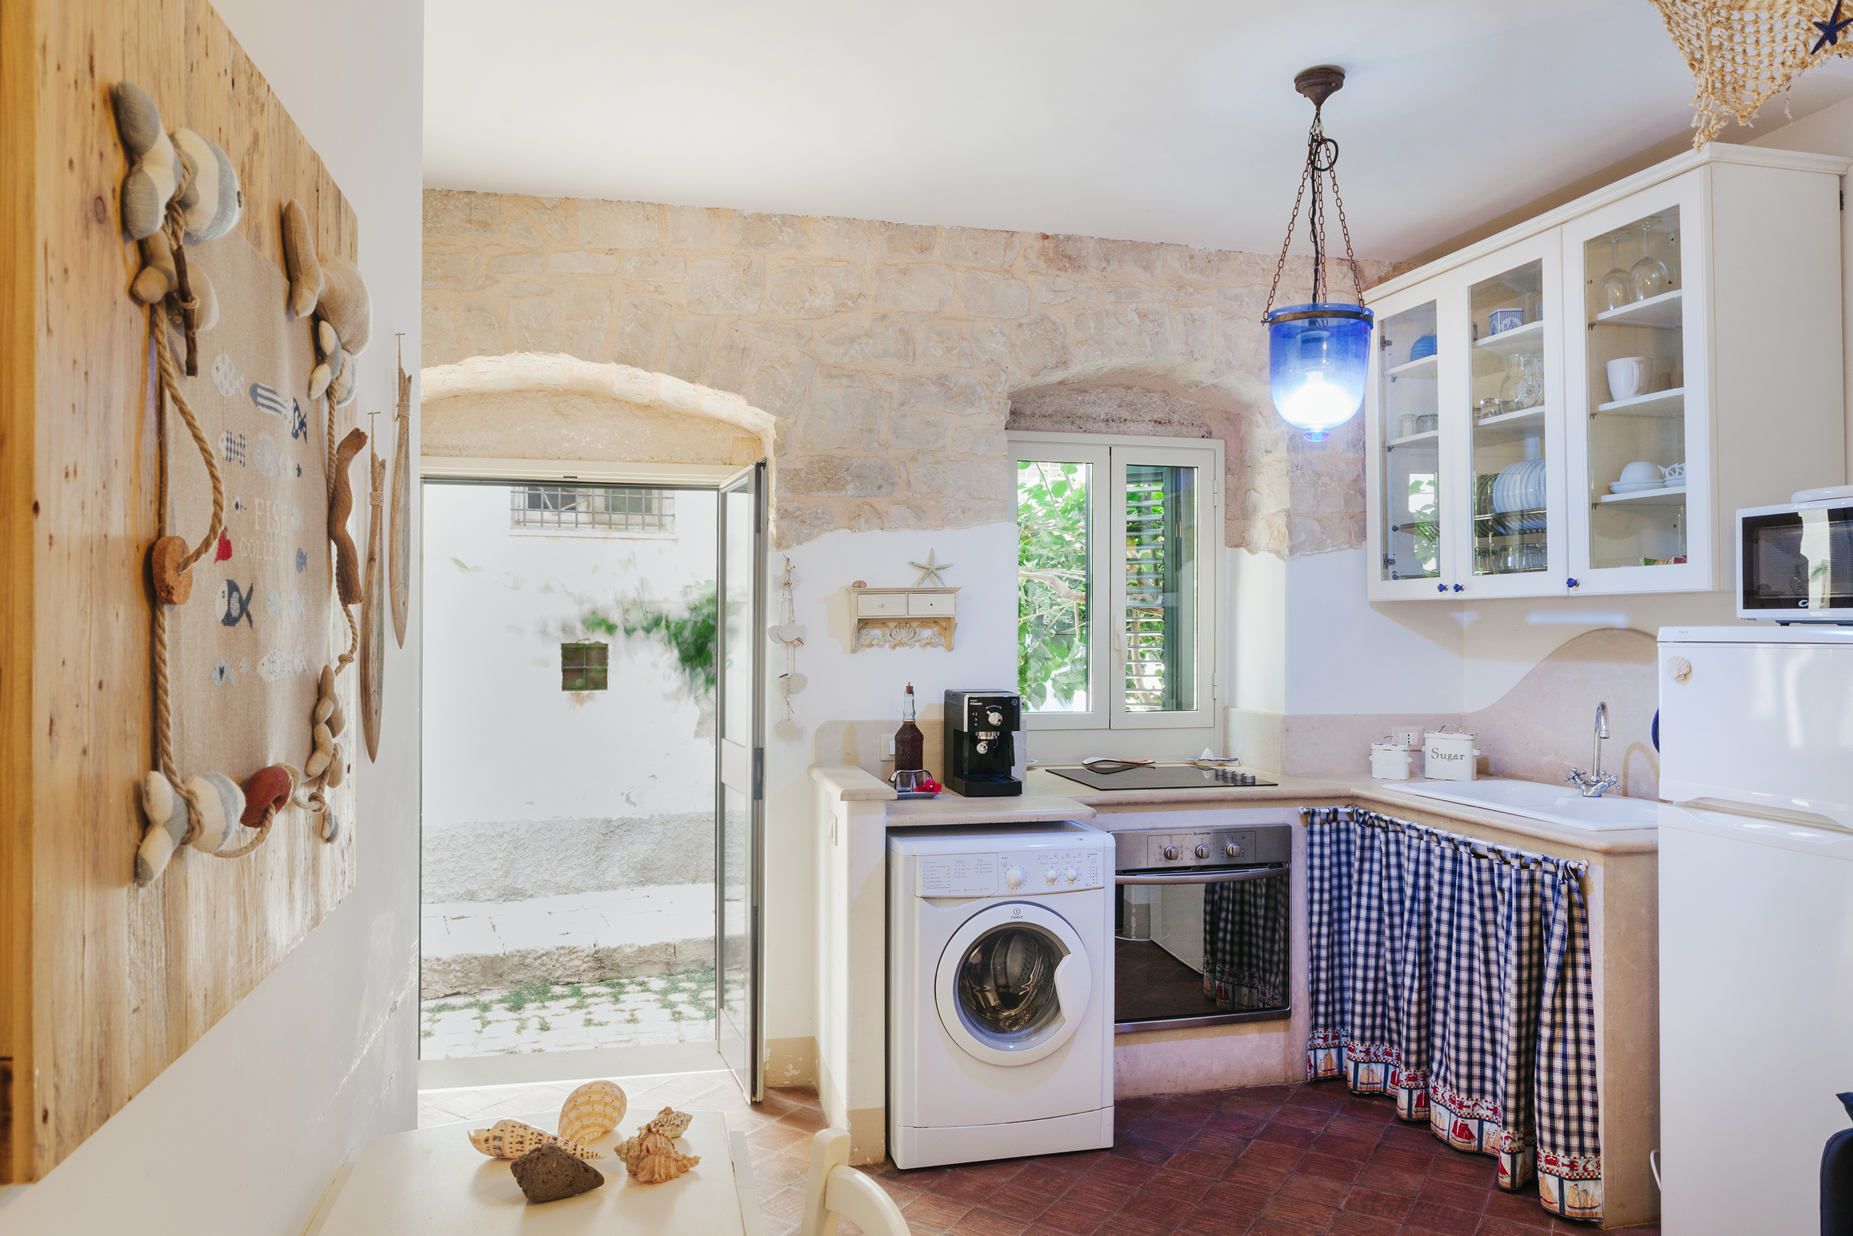 6sampieri-casa-vacanze-sicilia-appartamento-sicily-holiday-apartment-casa-del-pescatore-italia-italy.jpg